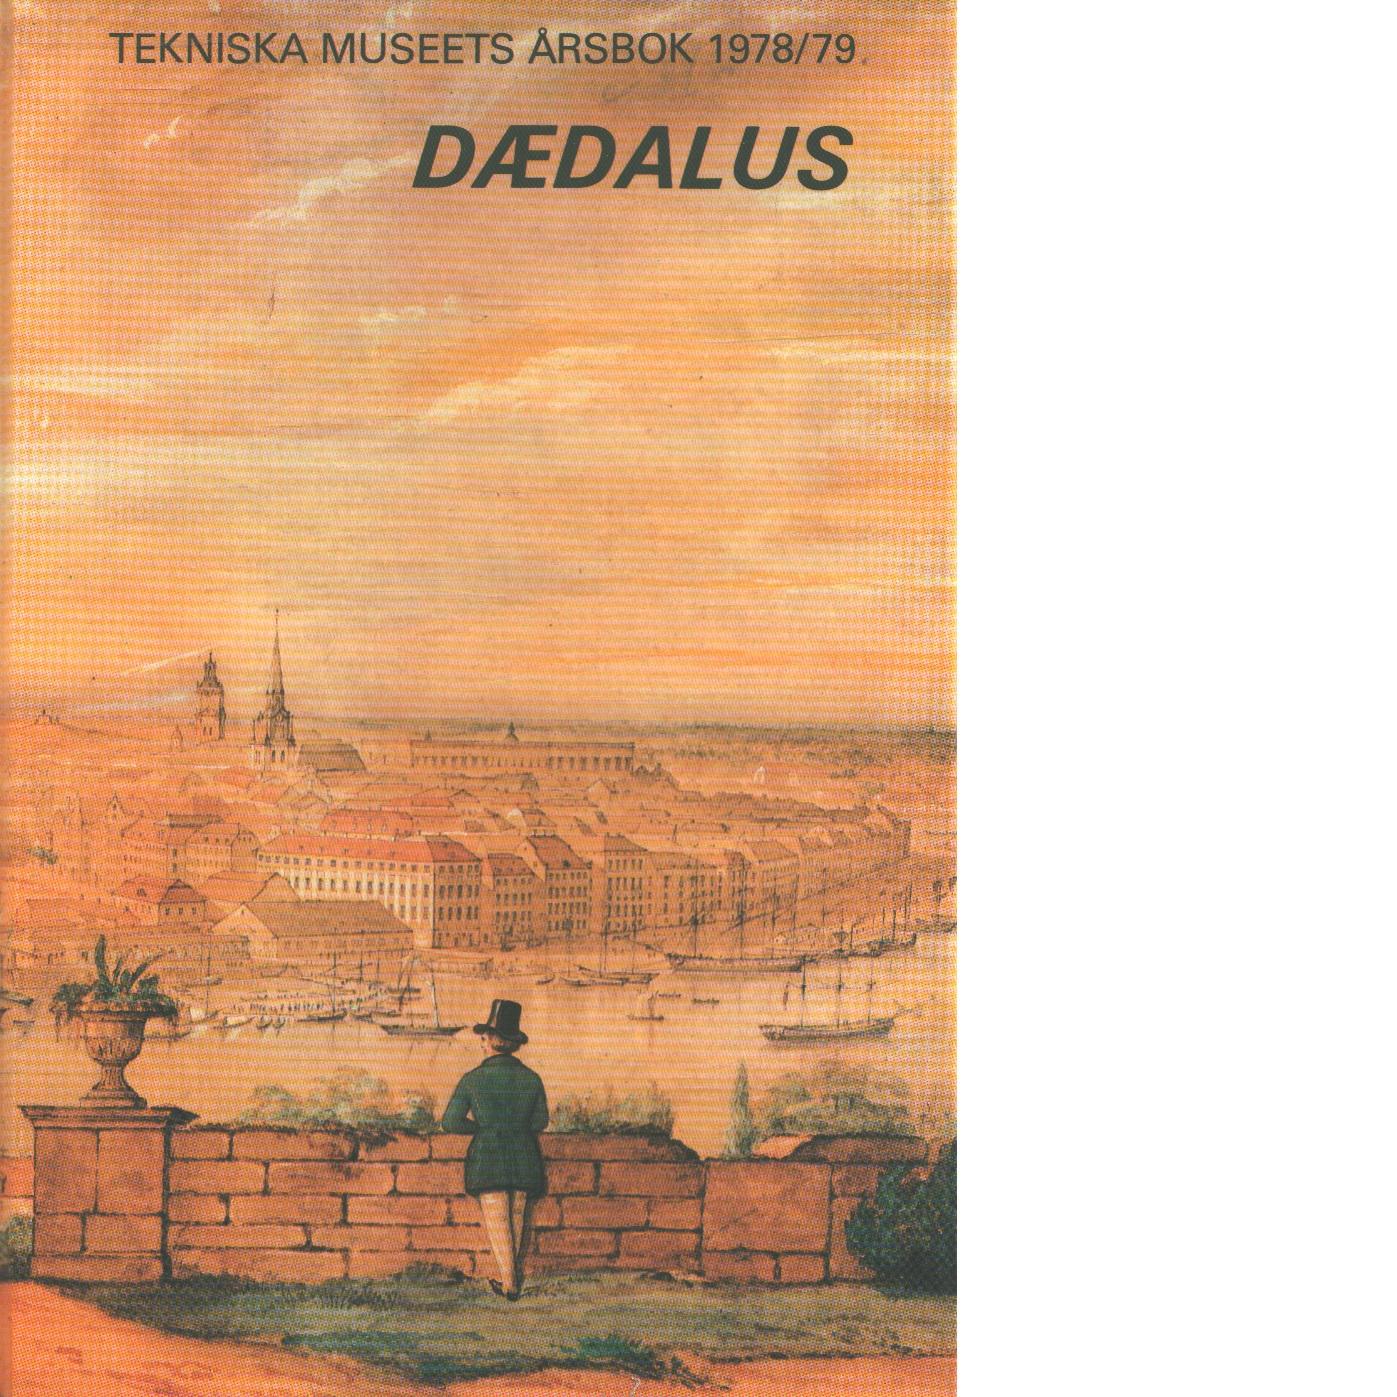 Tekniska museets årsbok. Årg. 48(1978/79) - Dædalus